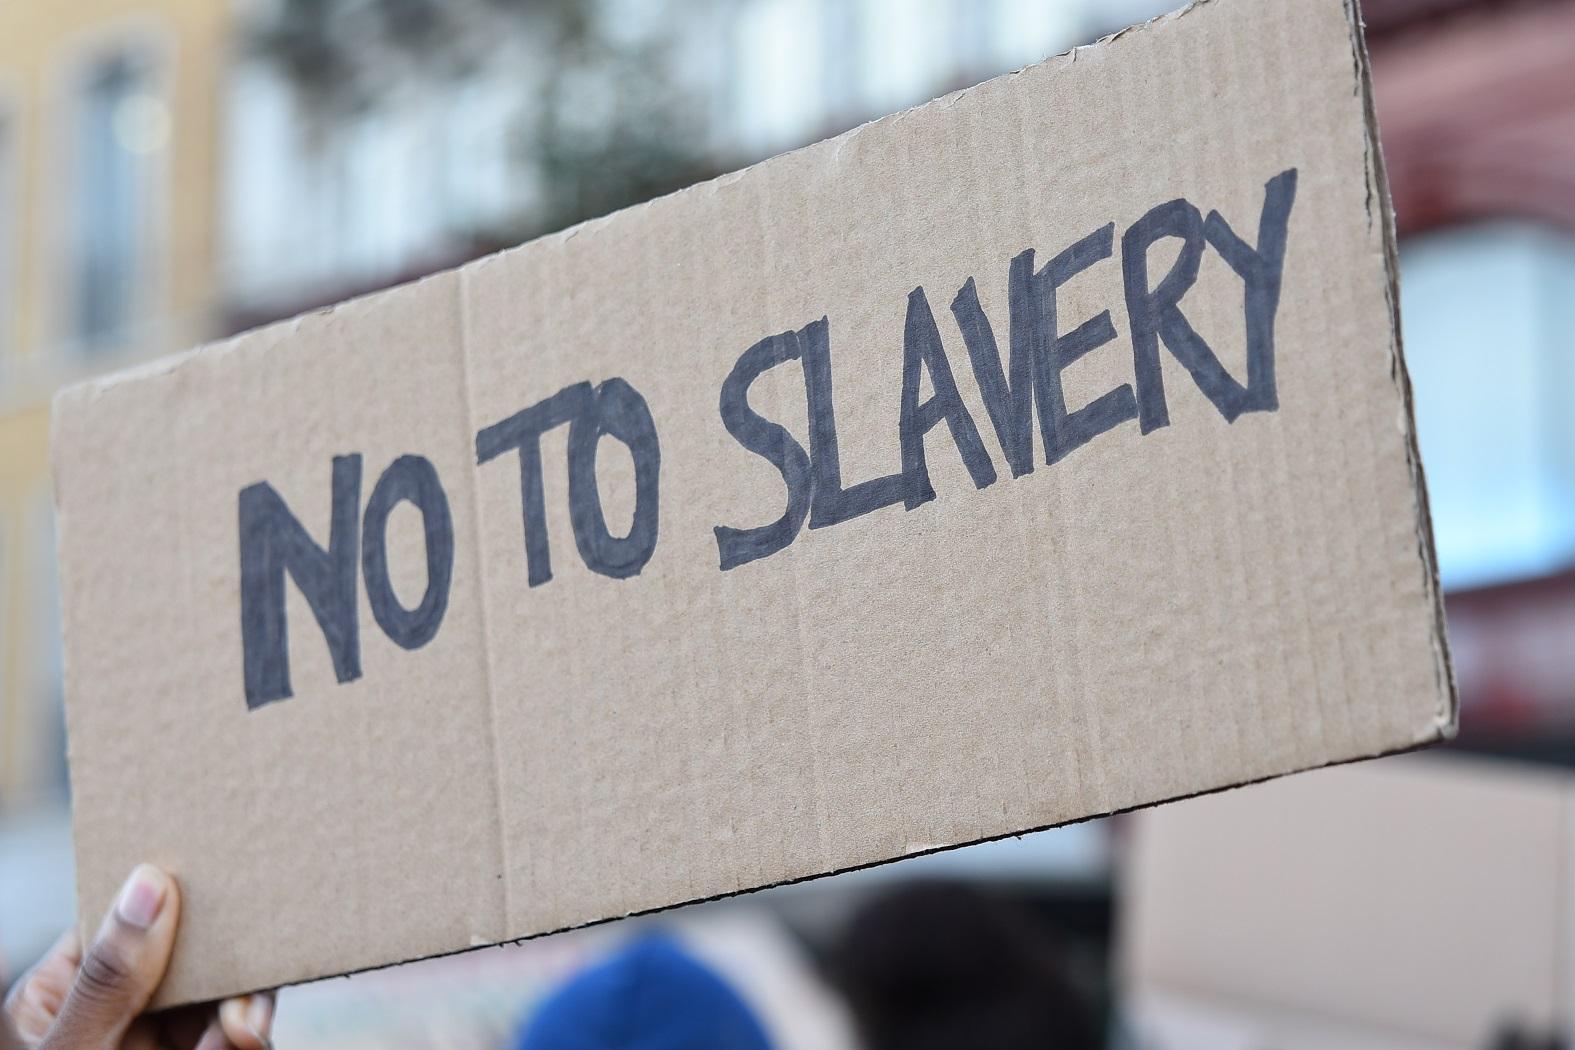 Protesto em Londres contra a escravidão na Líbia. Foto Alberto Pezzali/NurPhoto